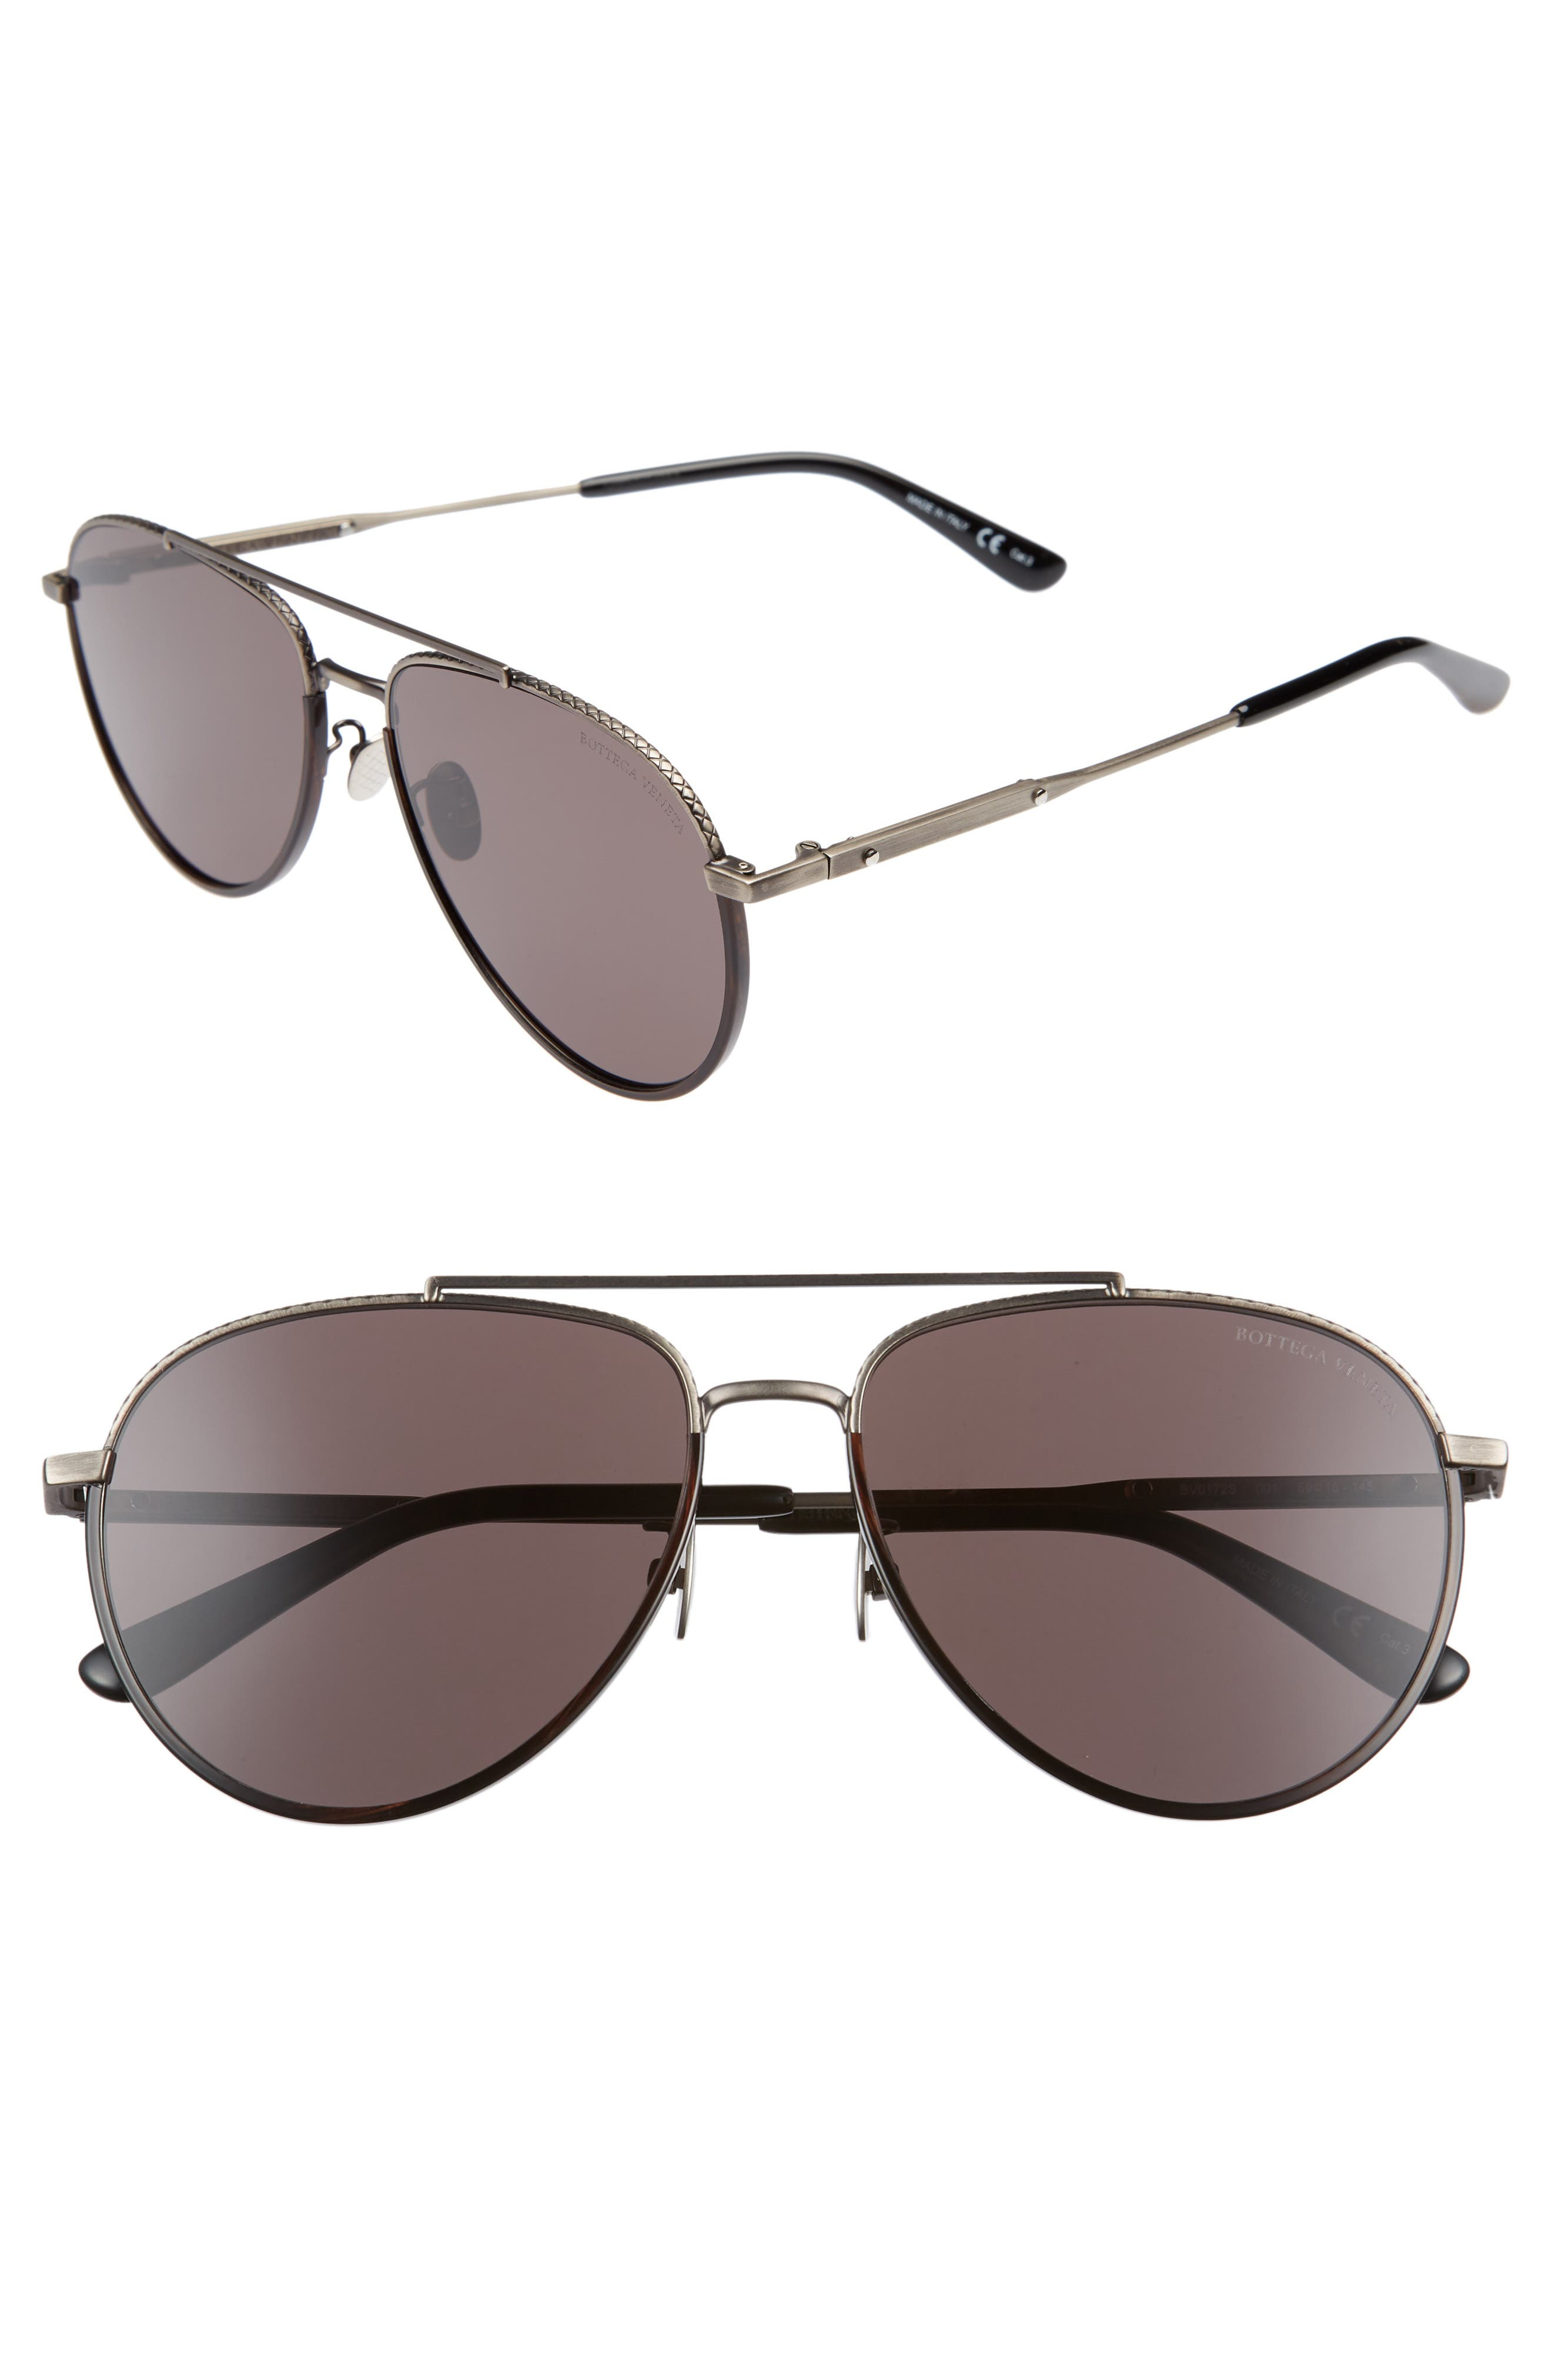 59mm Aviator Sunglasses,                         Main,                         color, SILVER/ BLACK